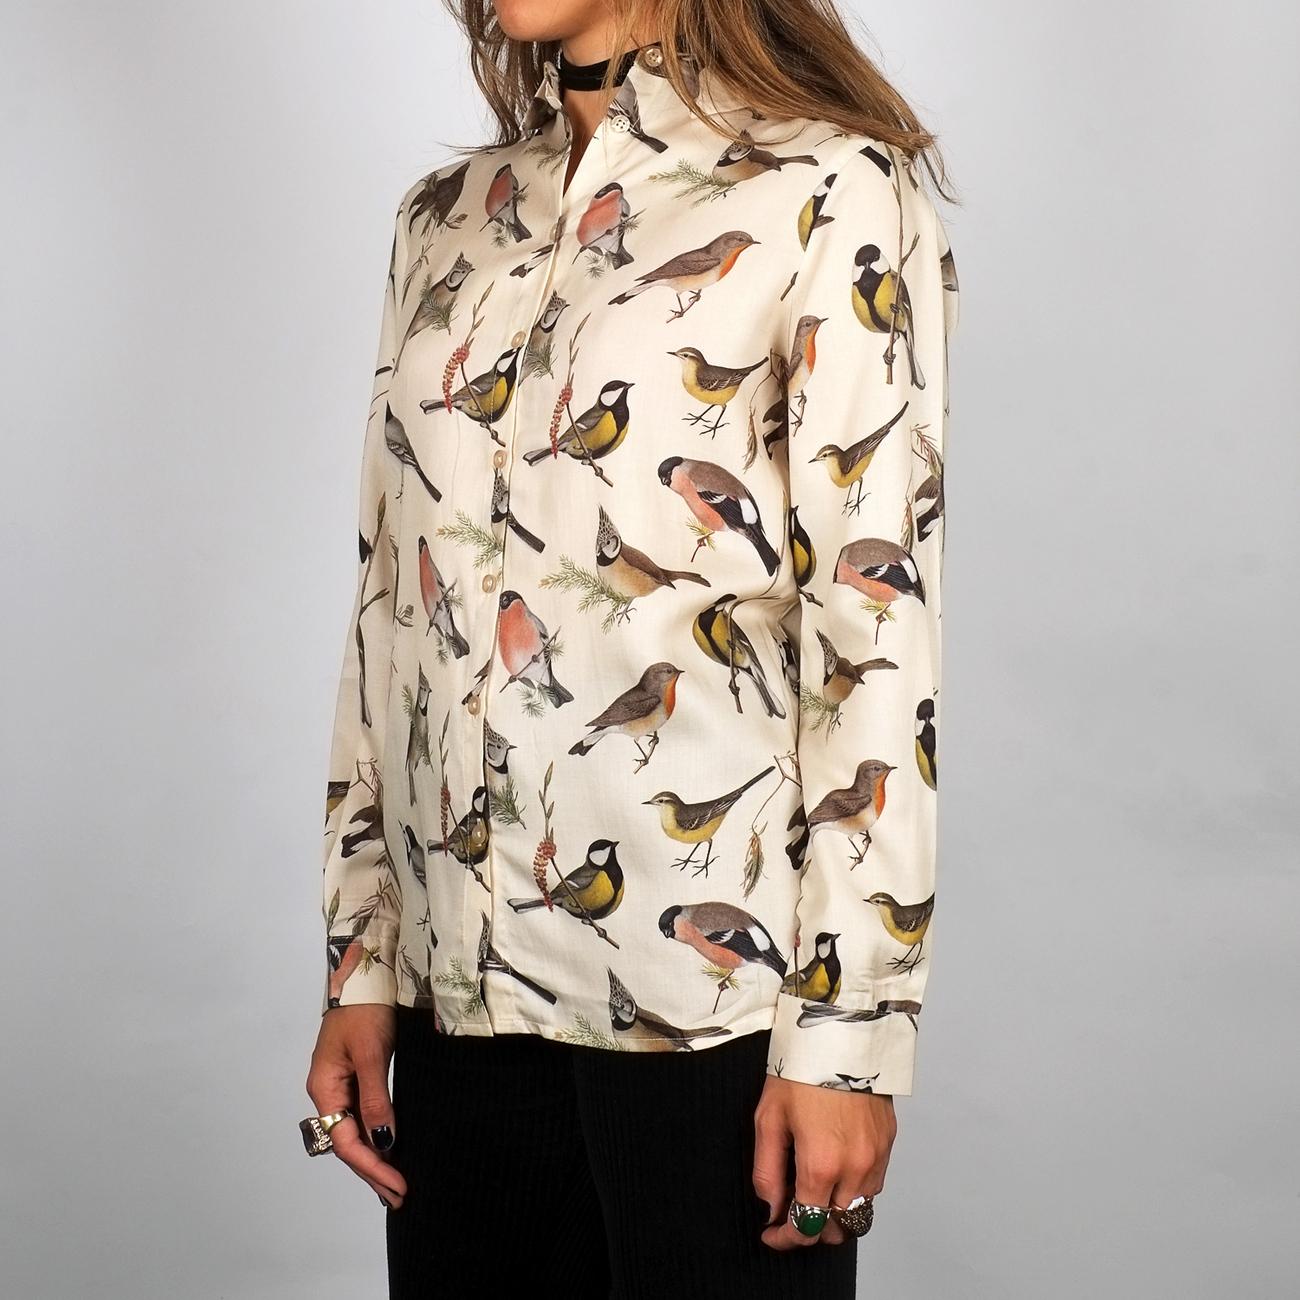 Shirt Dorothea Autumn Birds Off-White